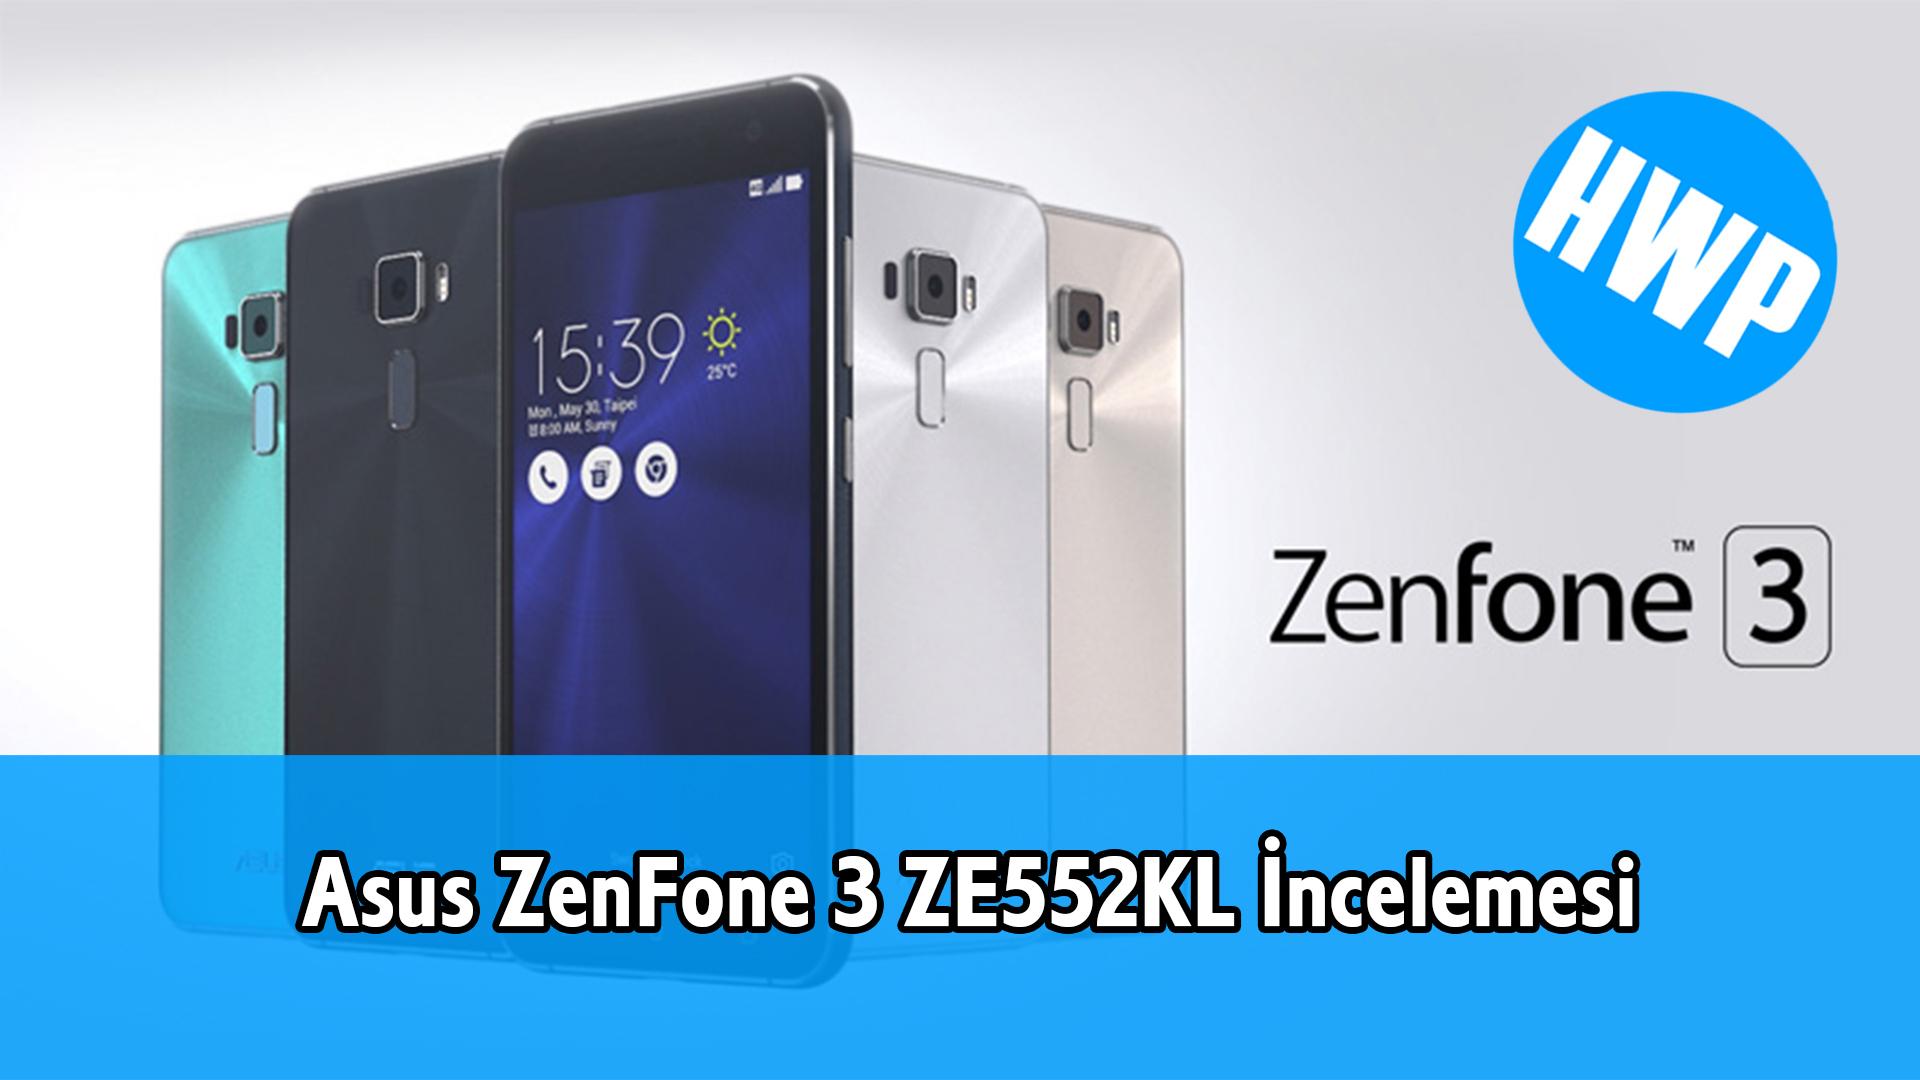 Asus Zenfone 3 ze552kl incelemesi